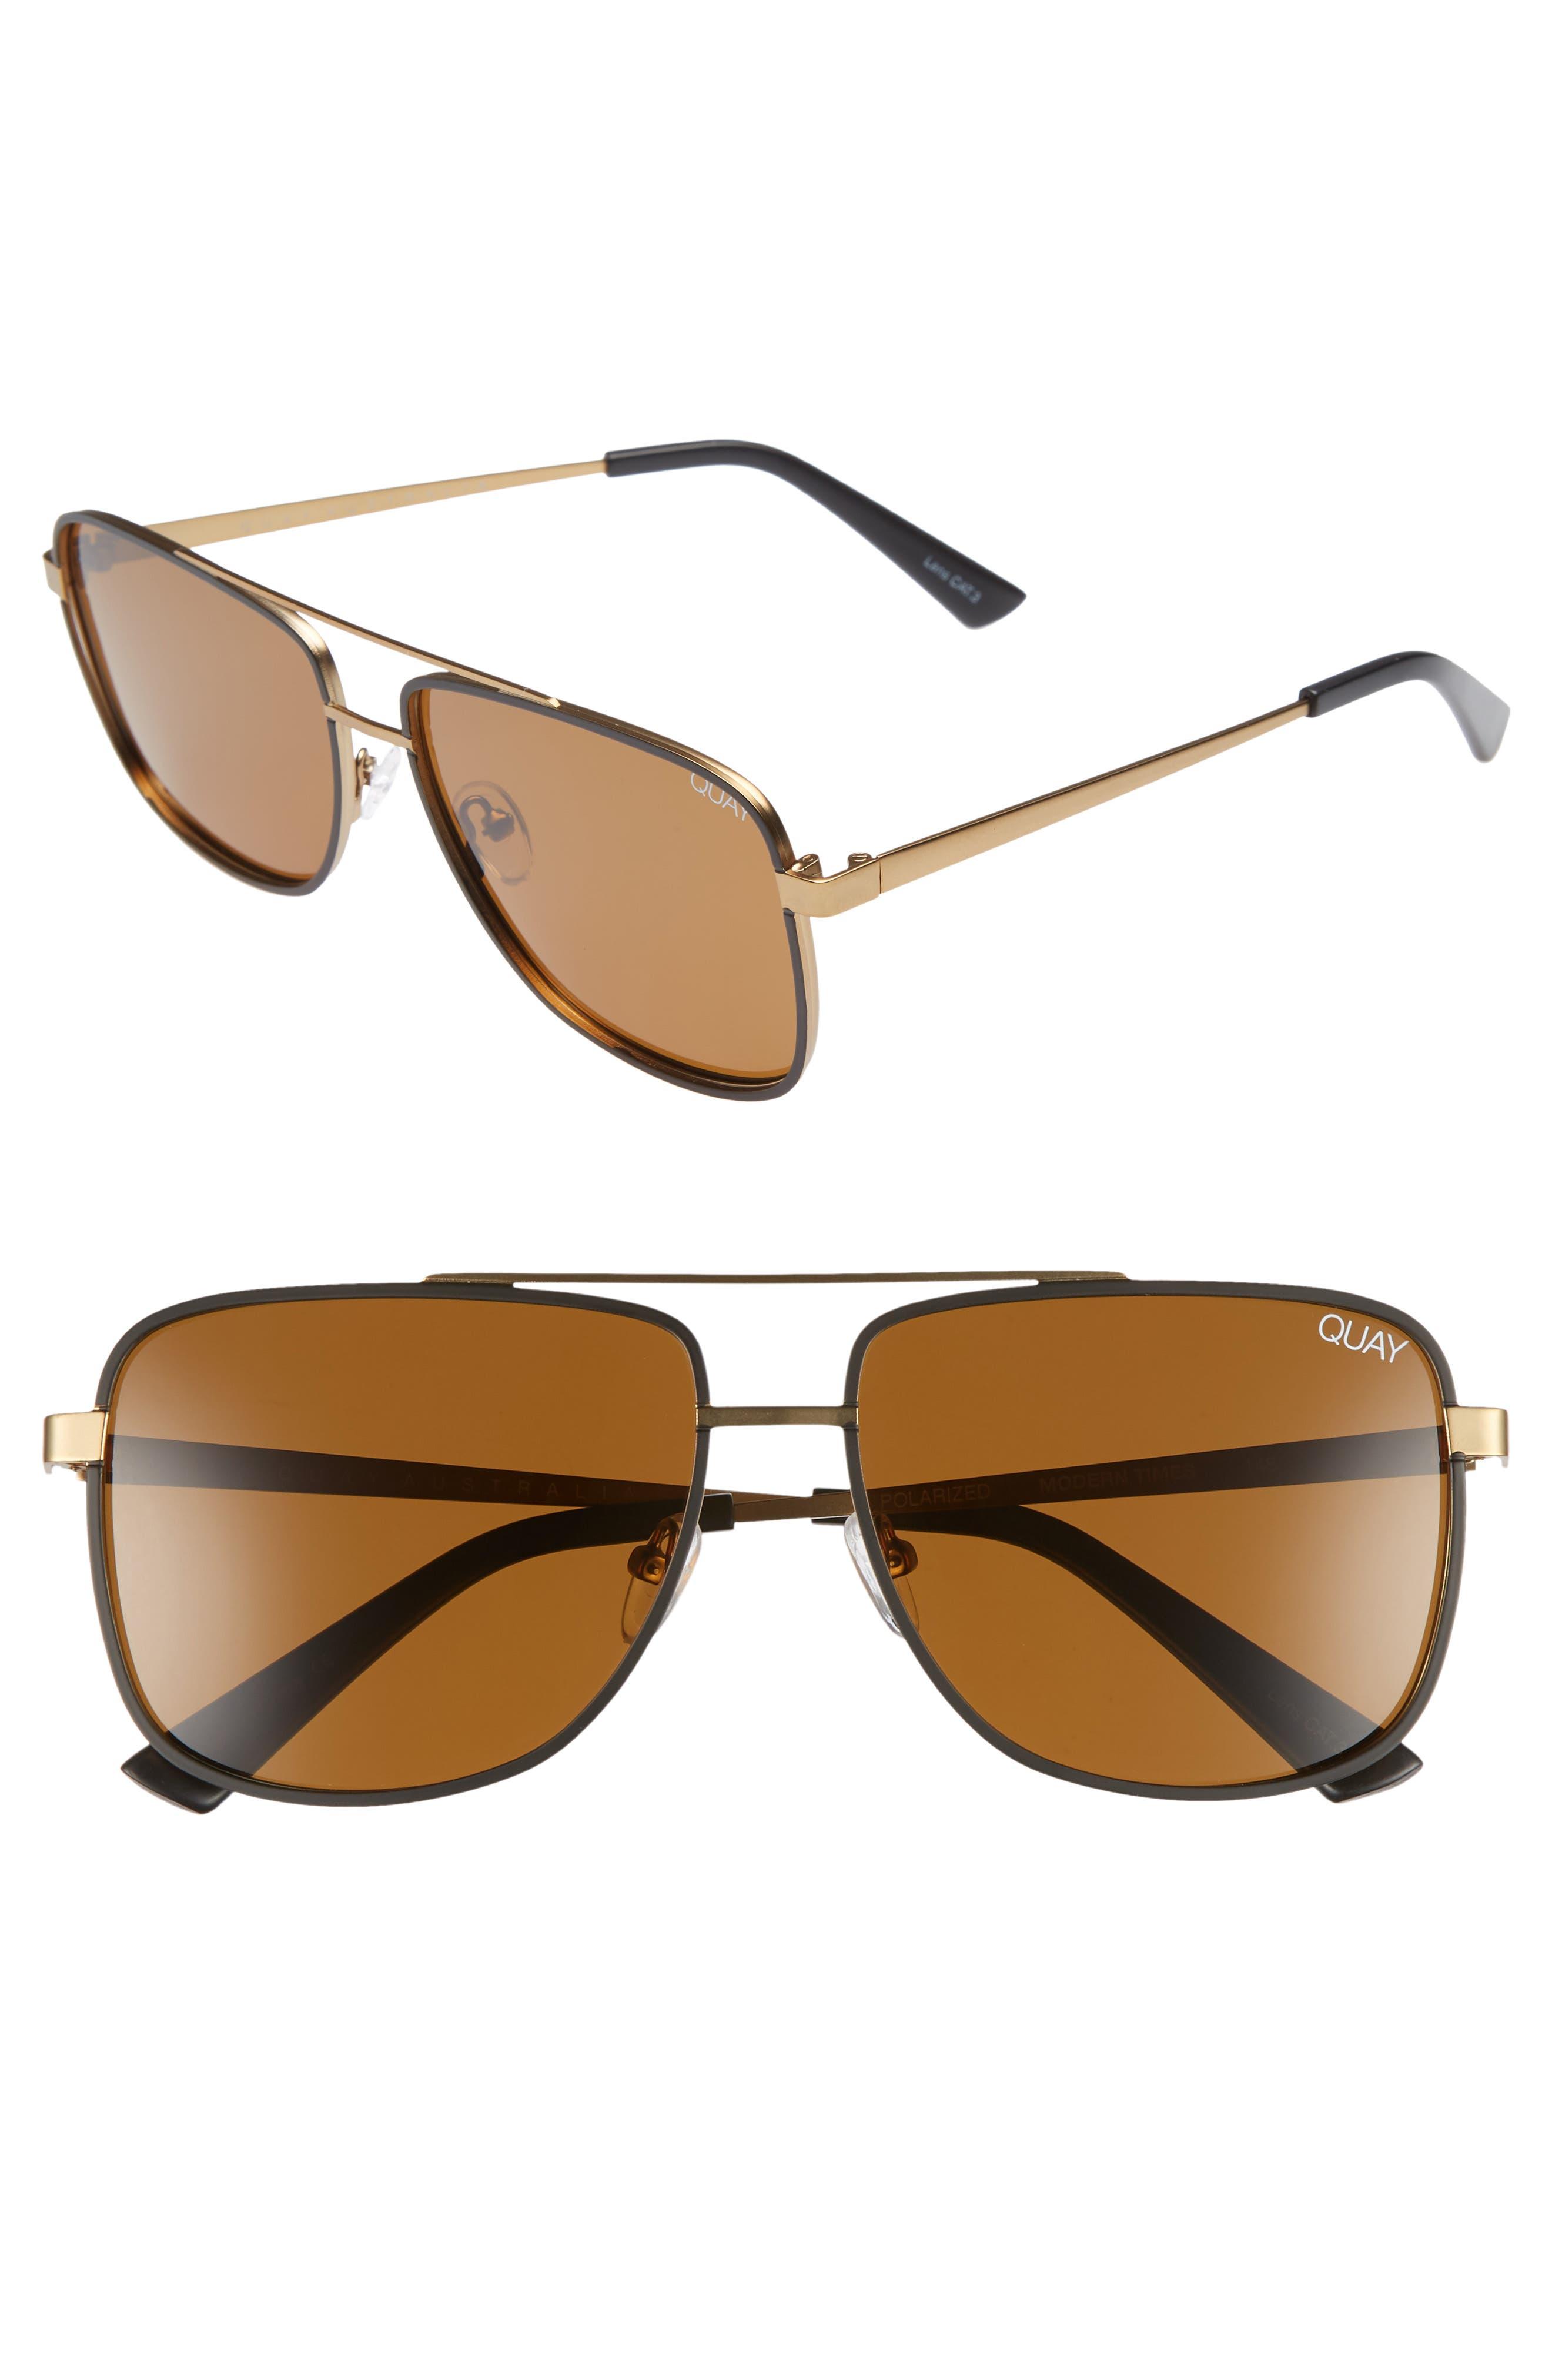 Quay Australia Modern Times 57Mm Polarized Aviator Sunglasses - Bronze Black / Brown Lens